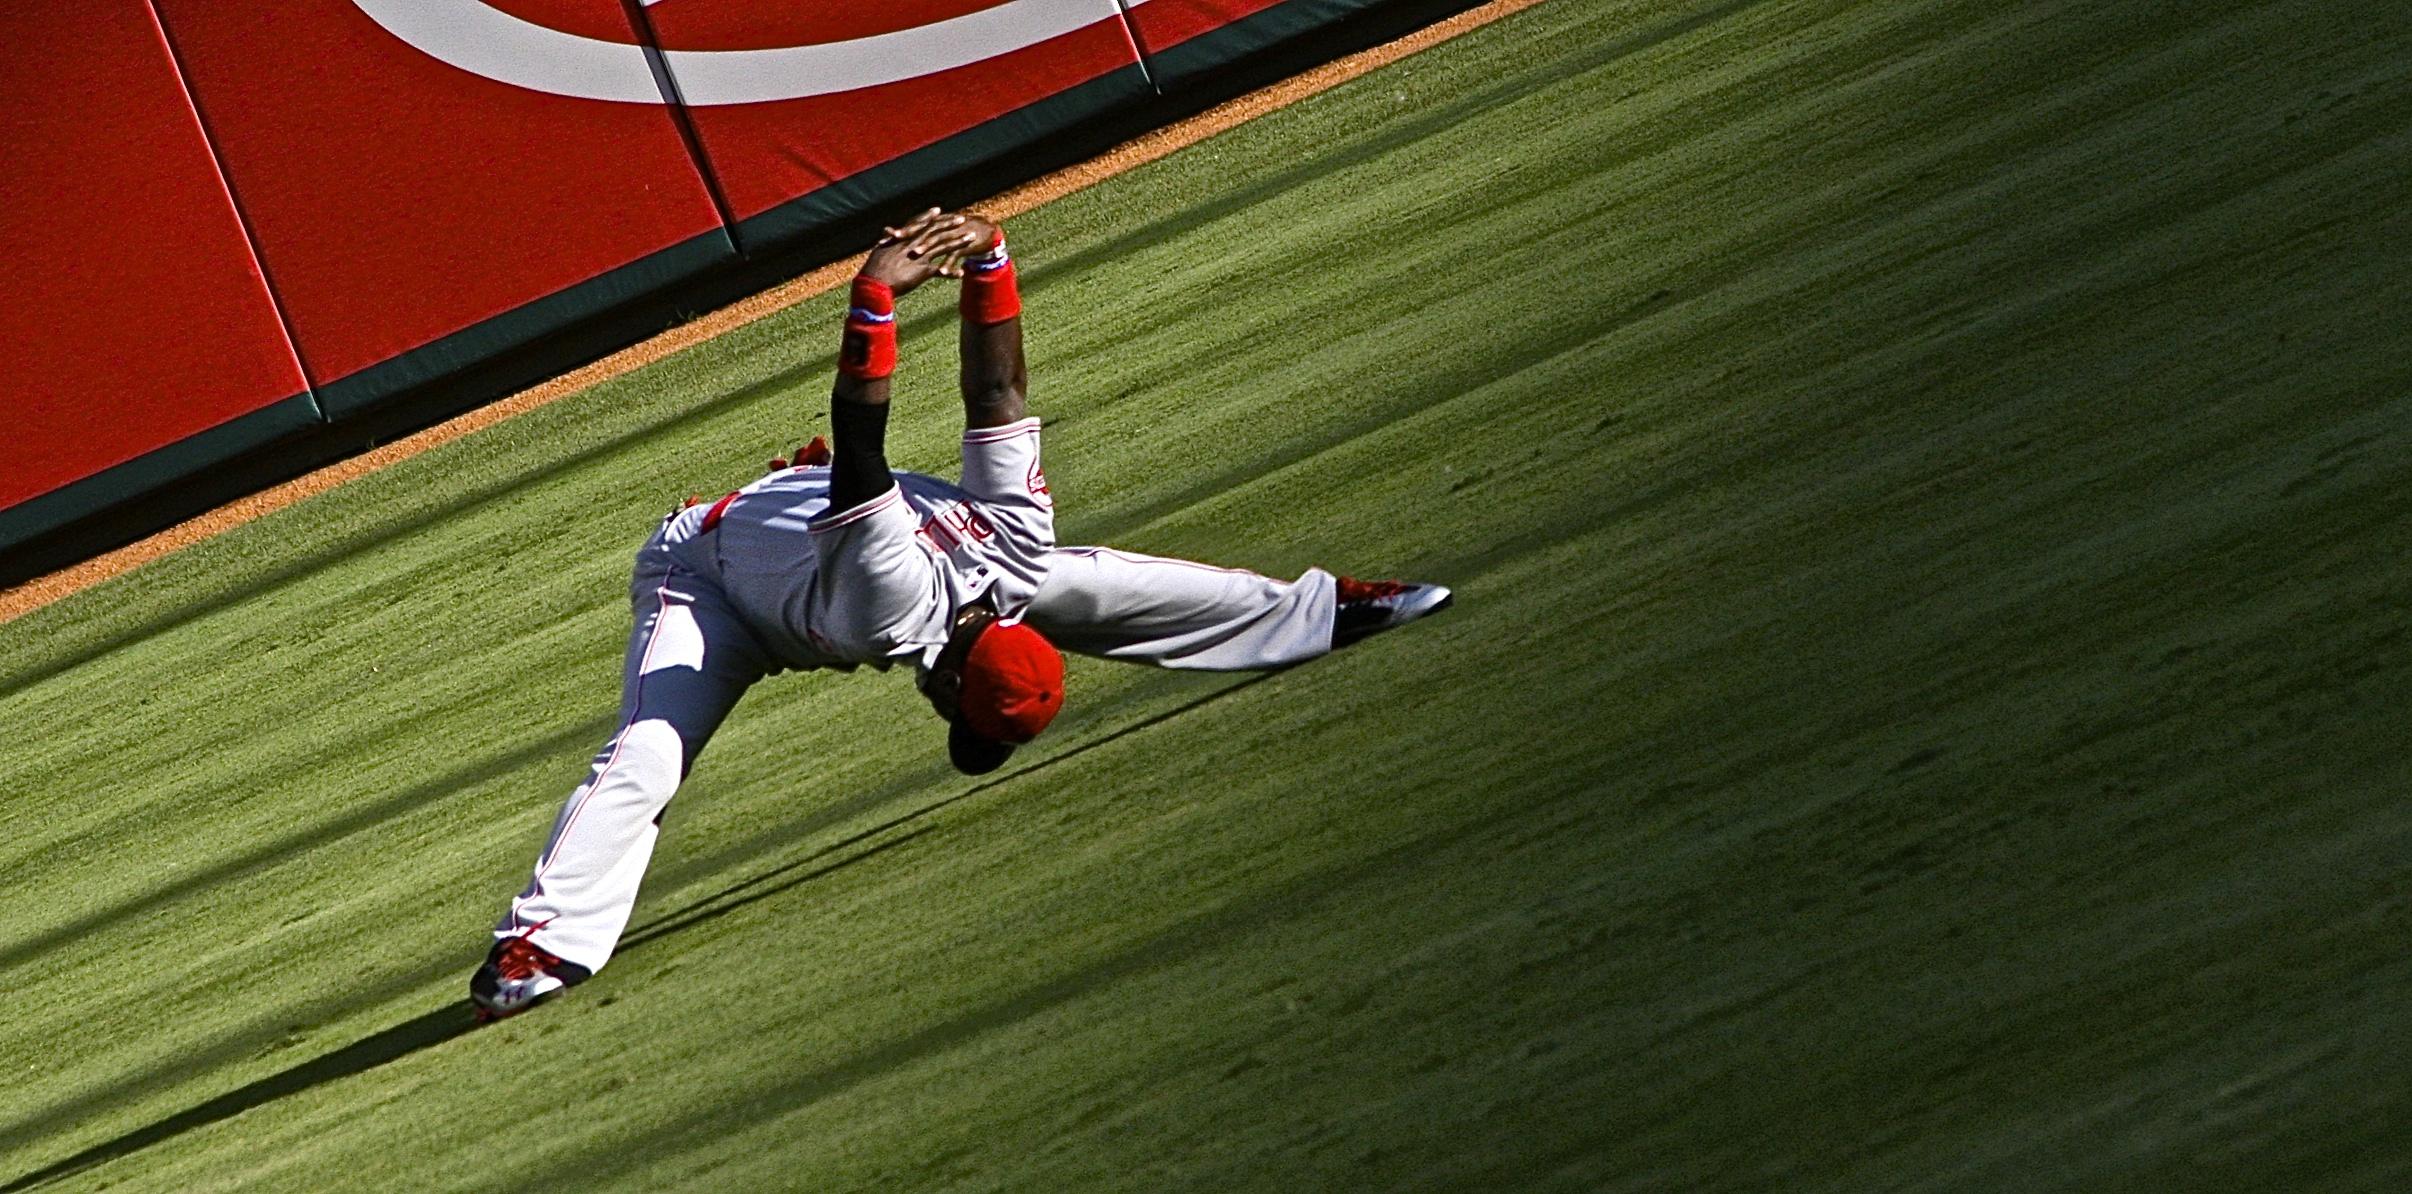 Brandon Phillips stretching